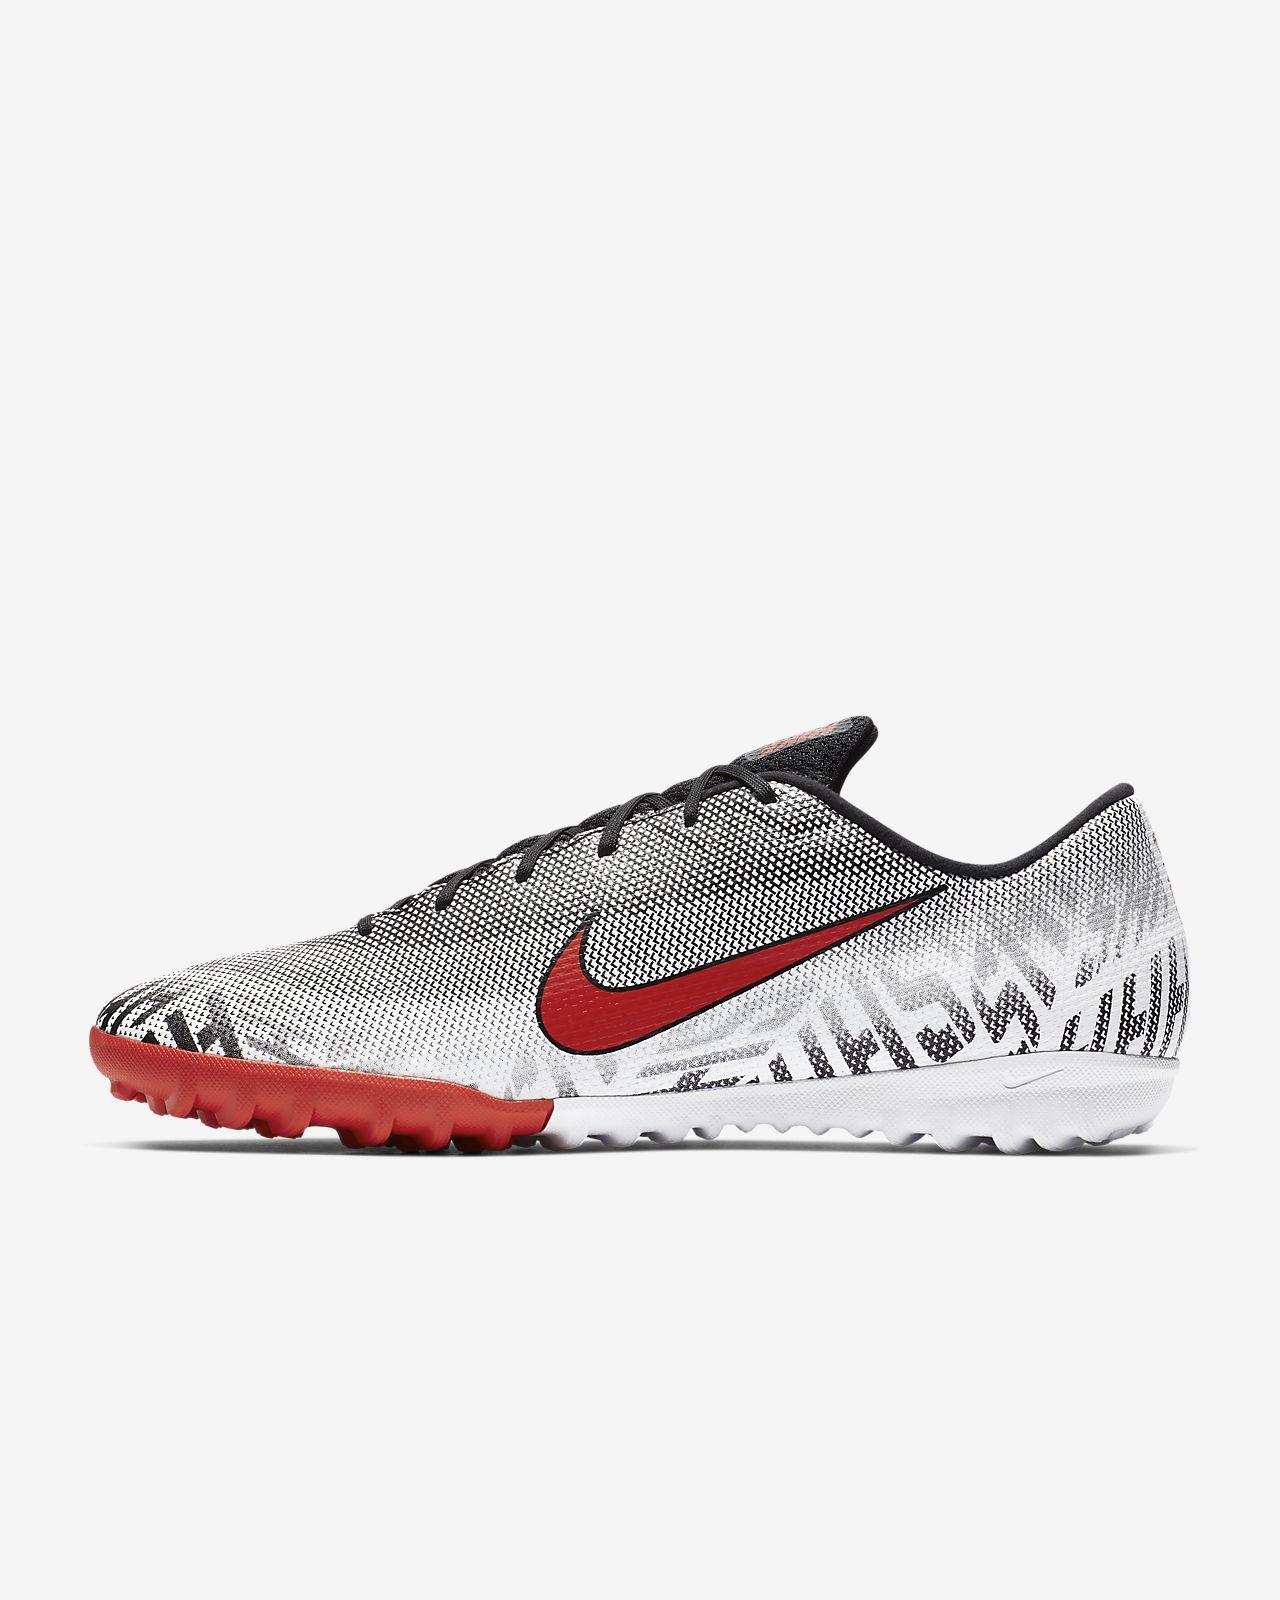 599f66eaf1905 ... Scarpa da calcio per erba artificiale sintetica Nike Mercurial Vapor XII  Academy Neymar TF